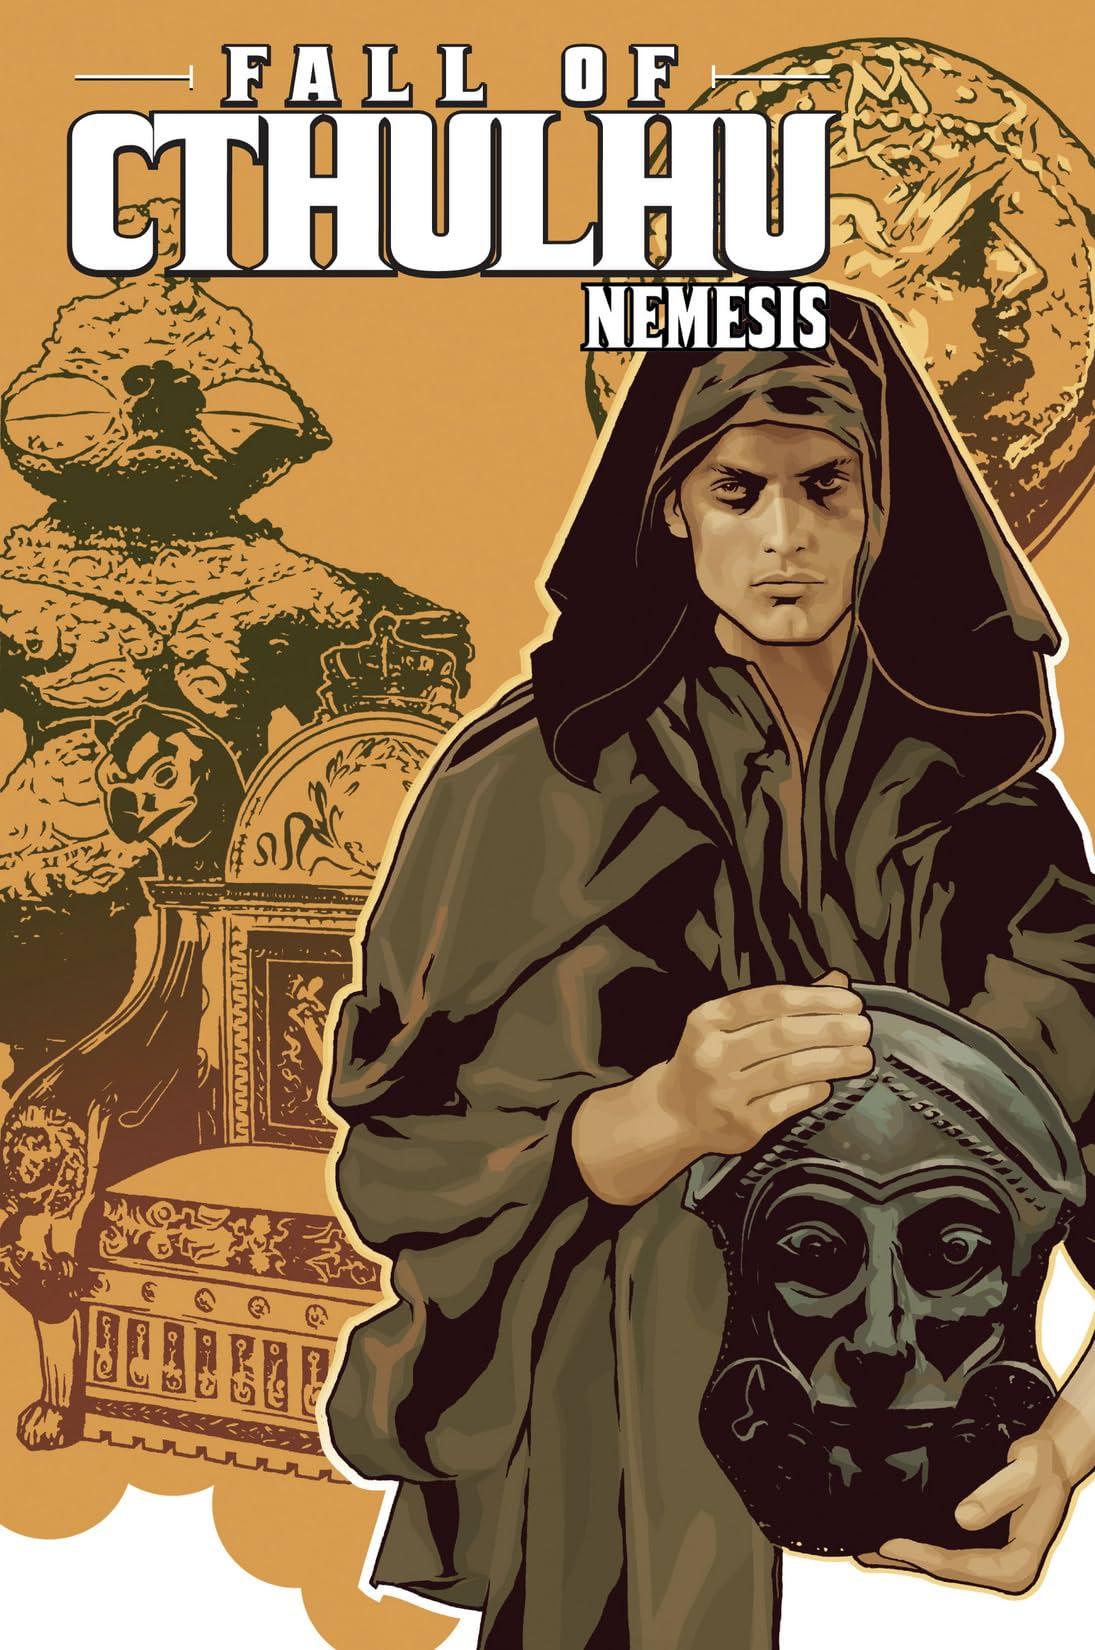 Fall of Cthulhu Vol. 6: Nemesis